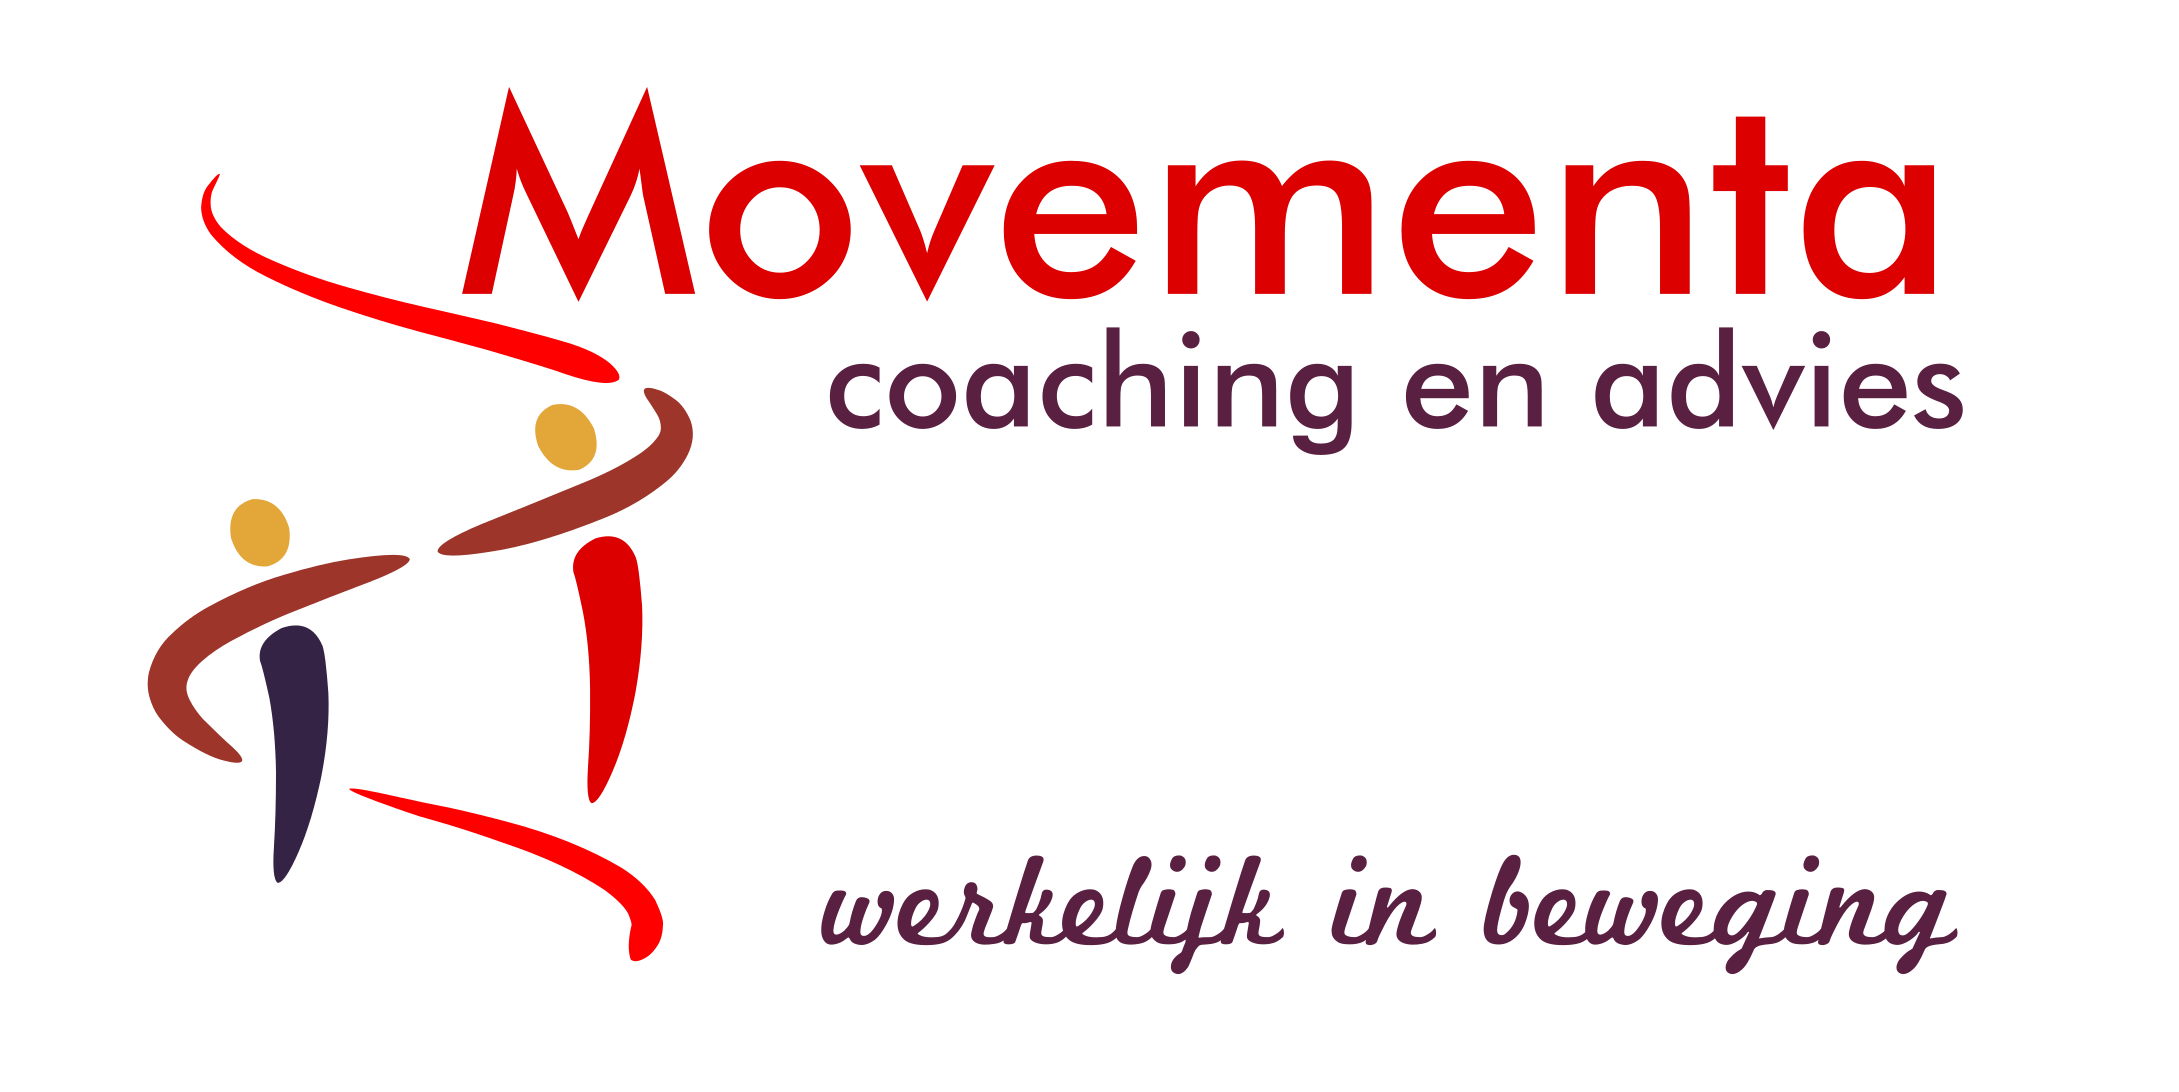 Movementa